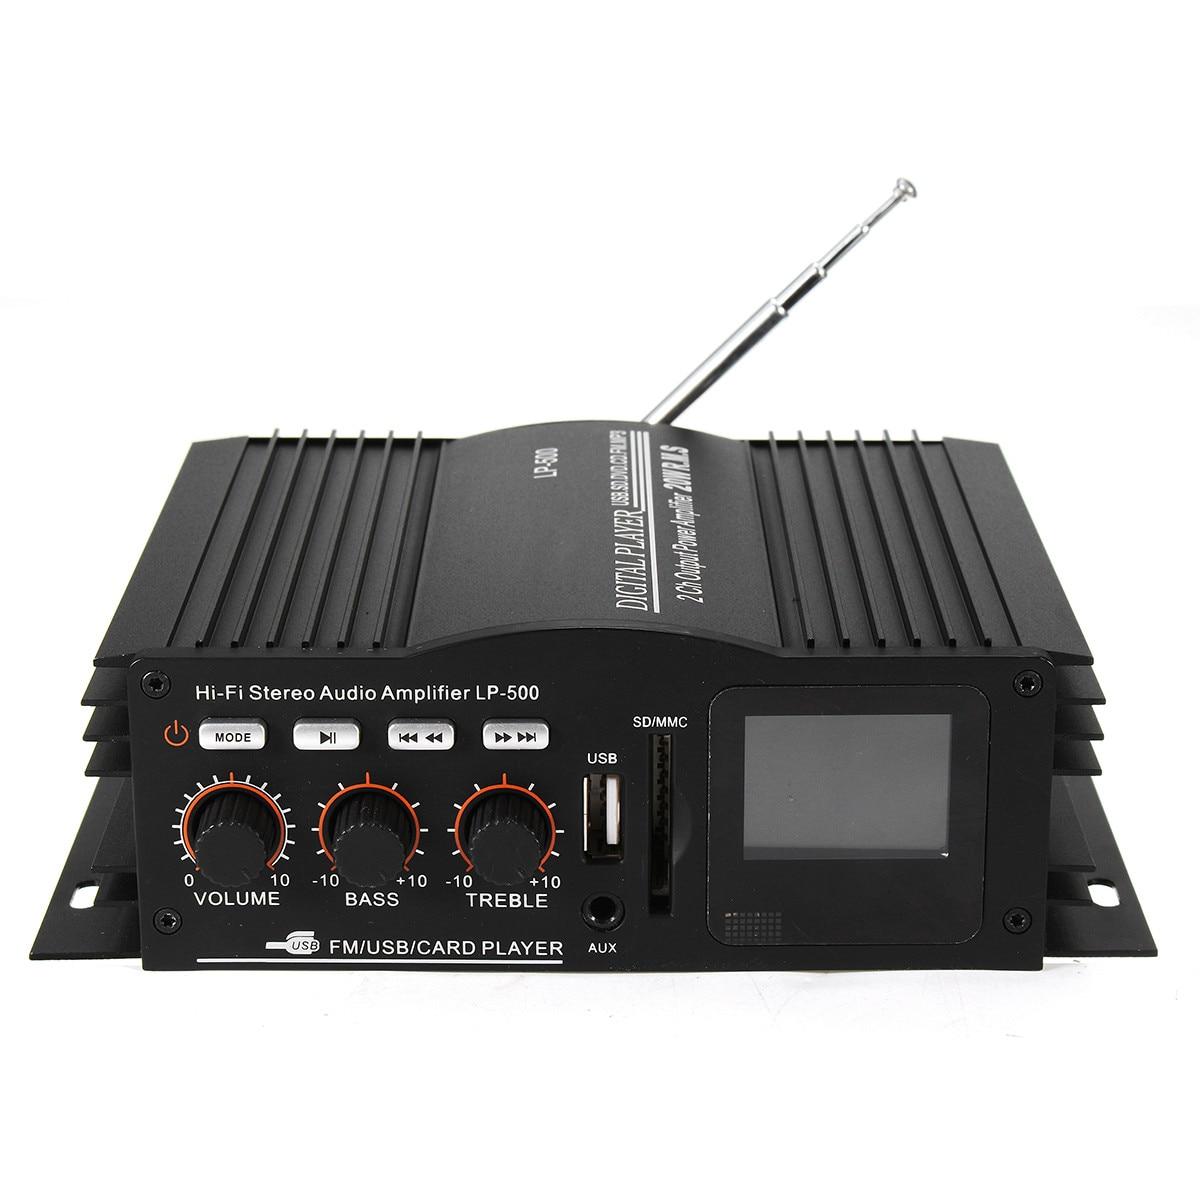 Lepy 50W 12V Mini Digital Amplifier FM Bass Booster For Car Home MP3 AMP Player